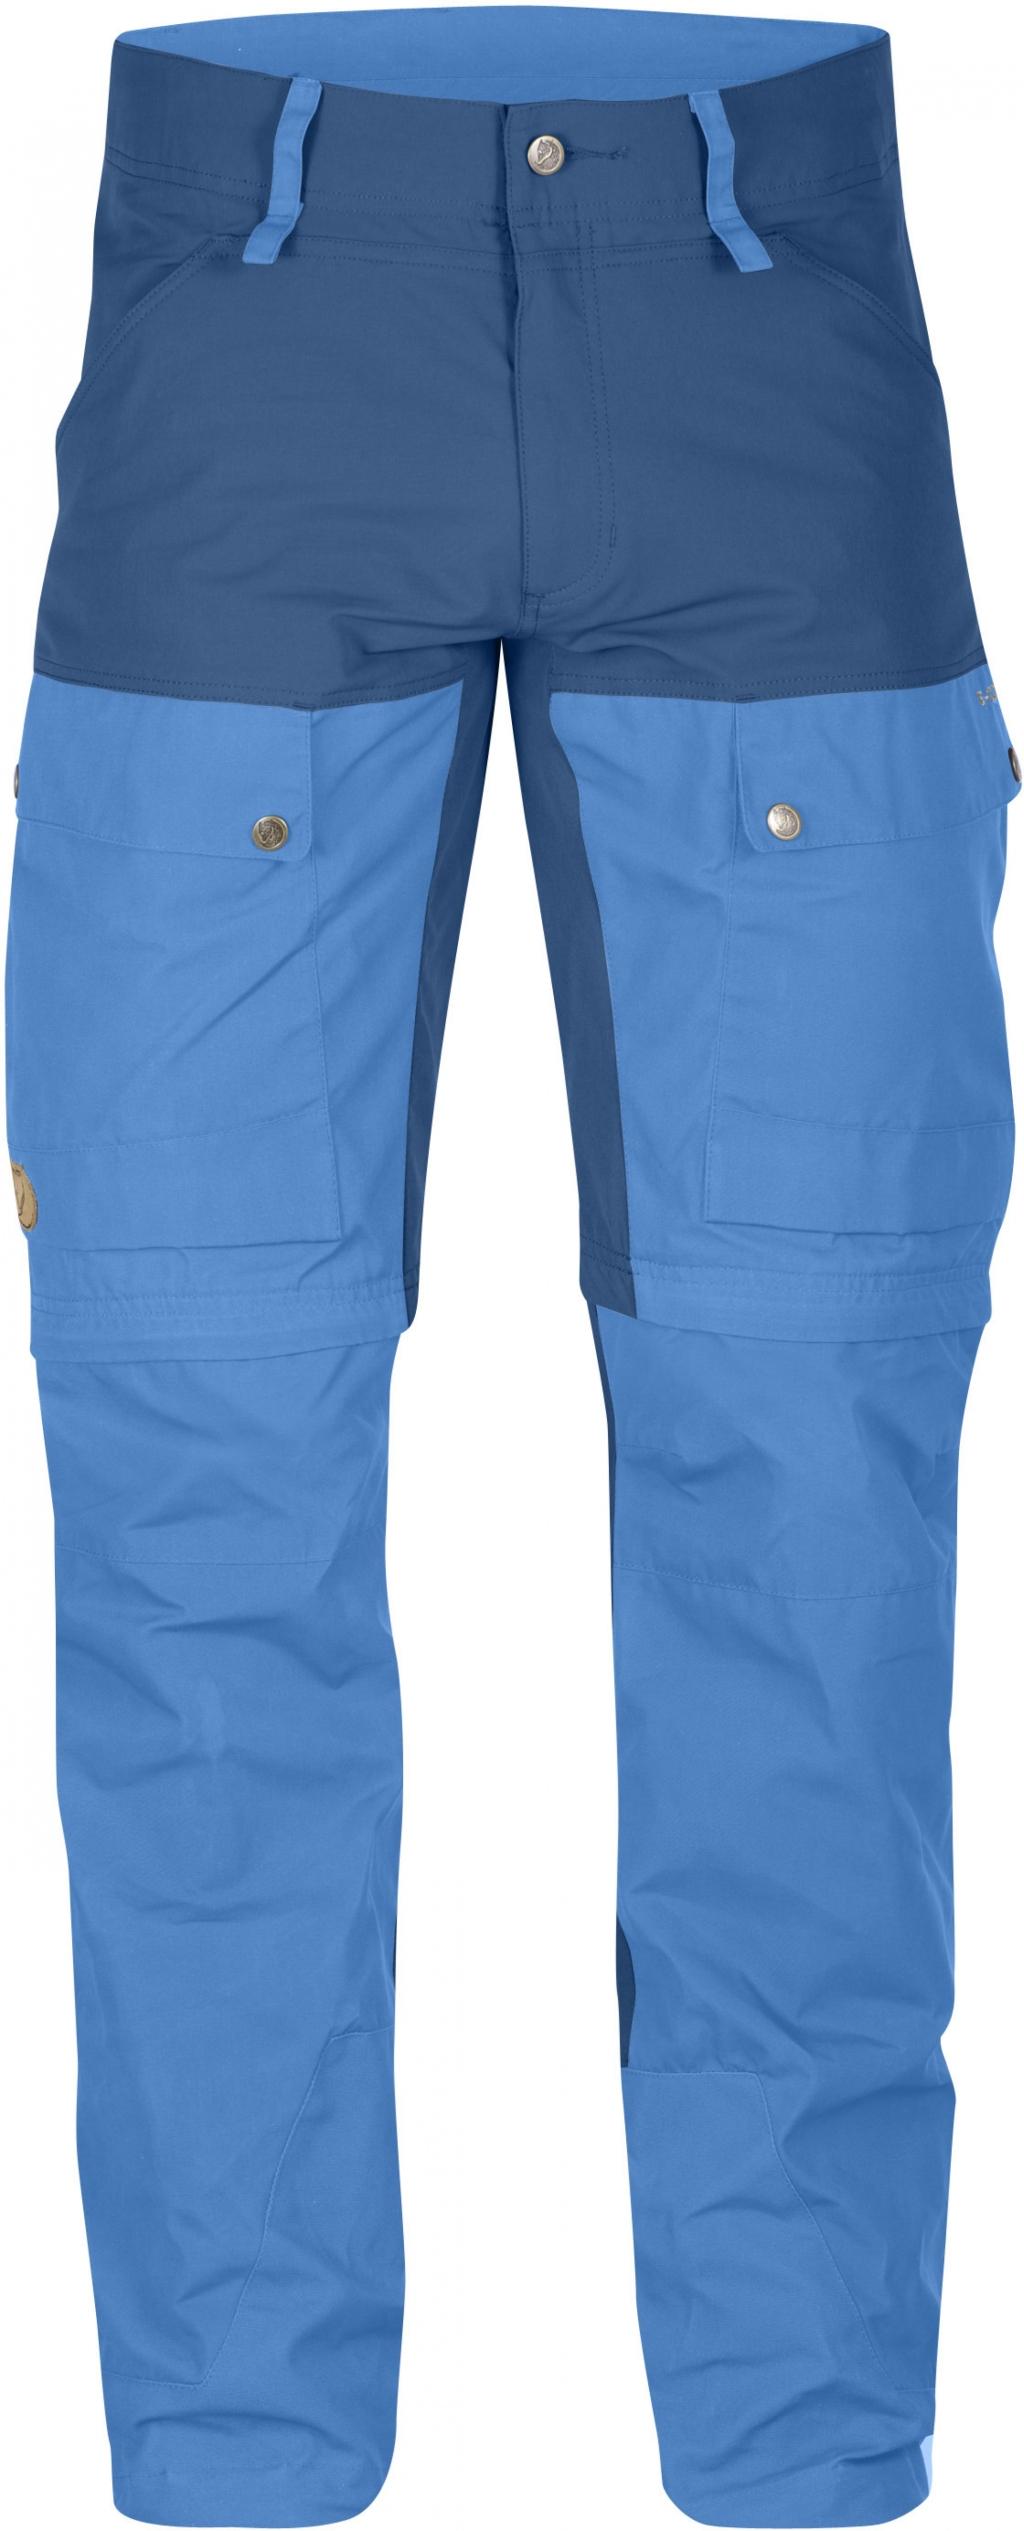 FjallRaven Keb Gaiter Trousers Regular UN Blue-30